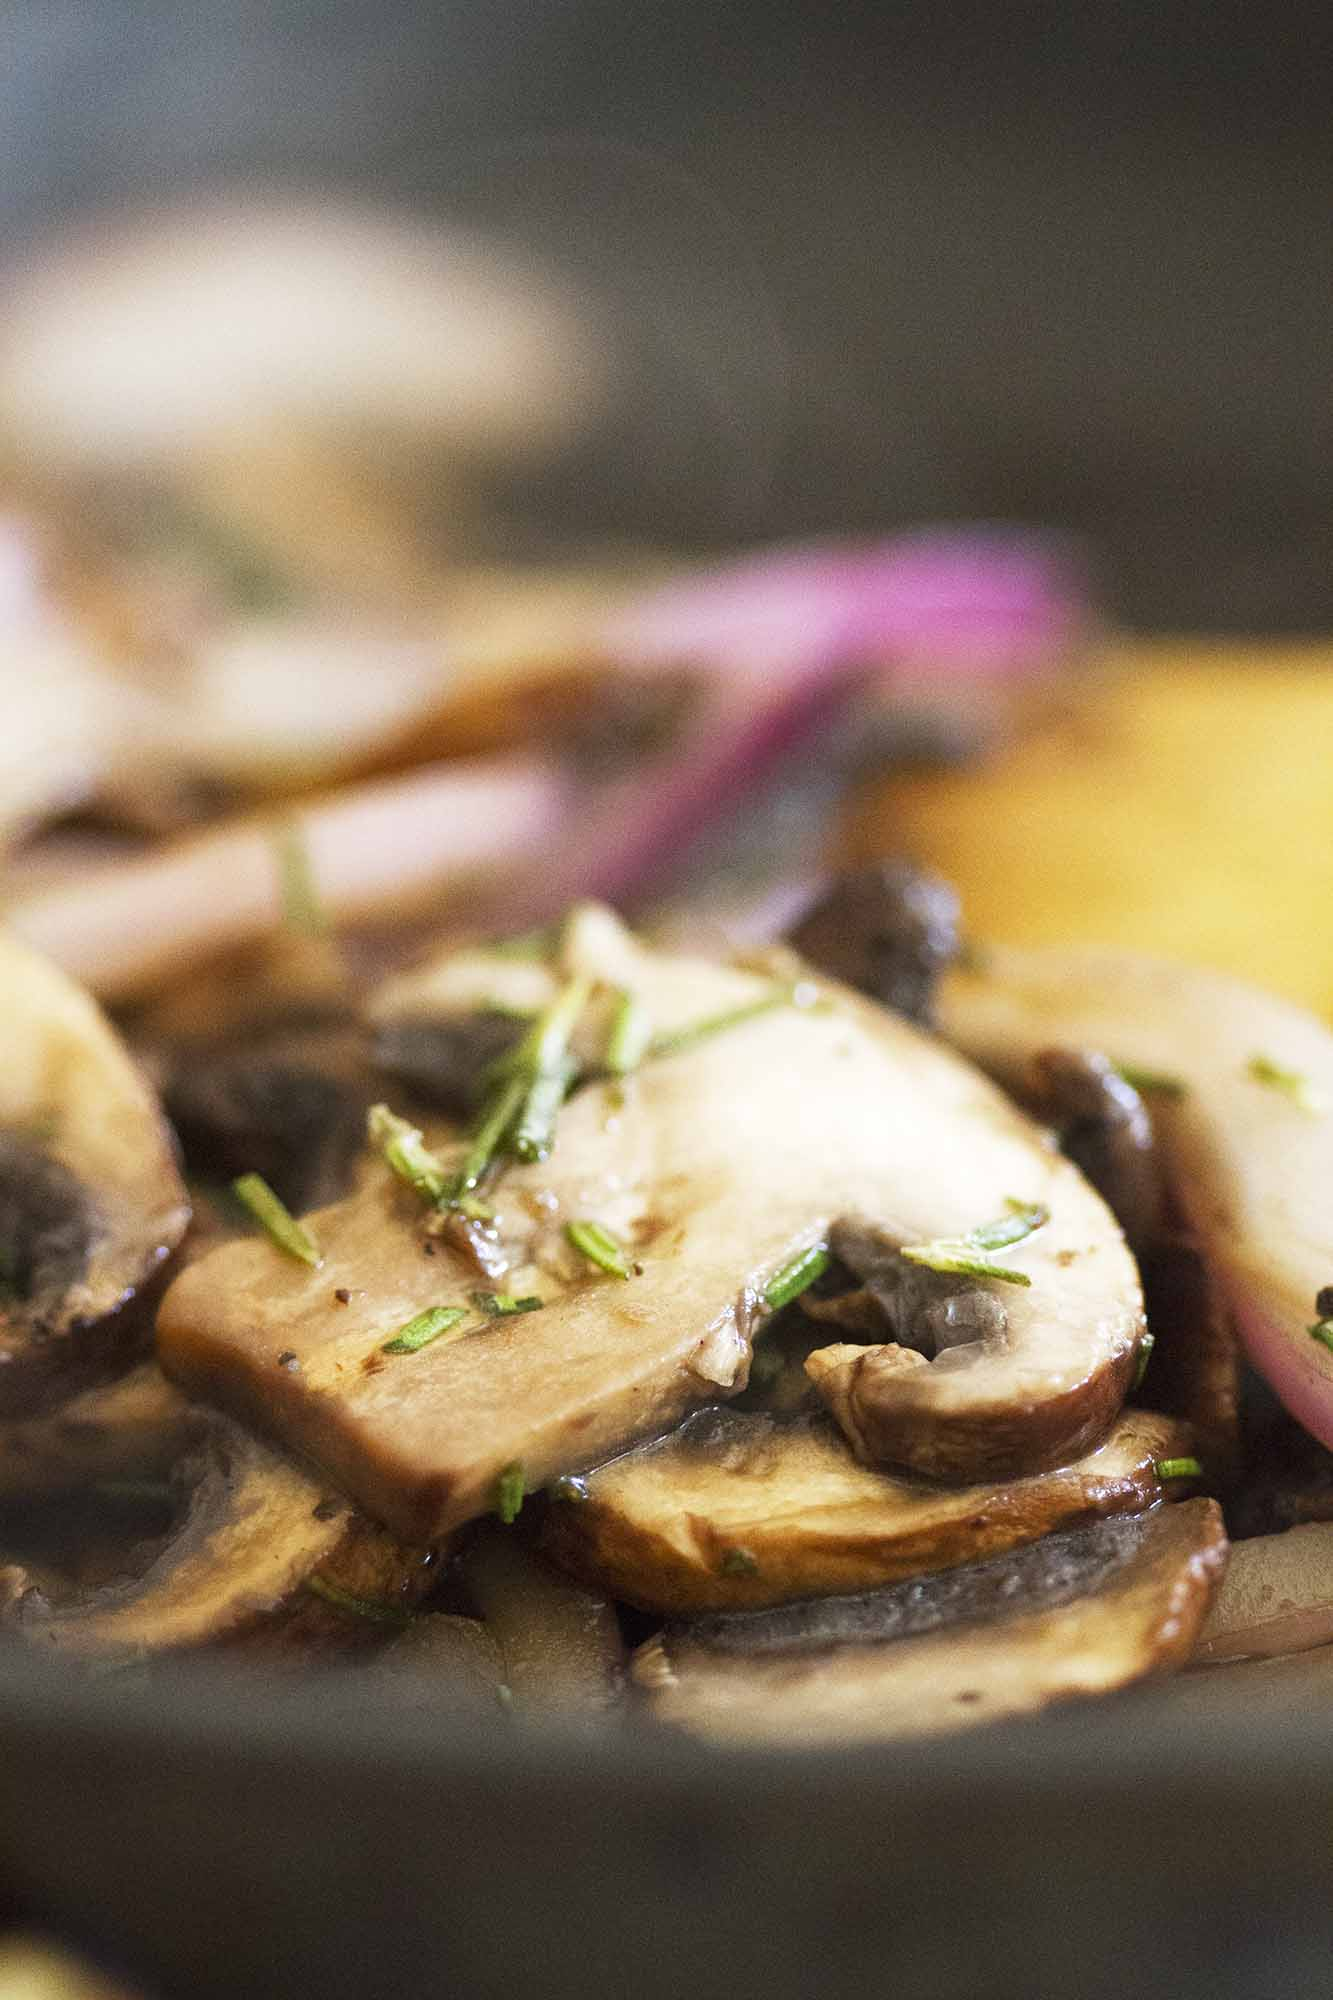 detail close up of mushroom